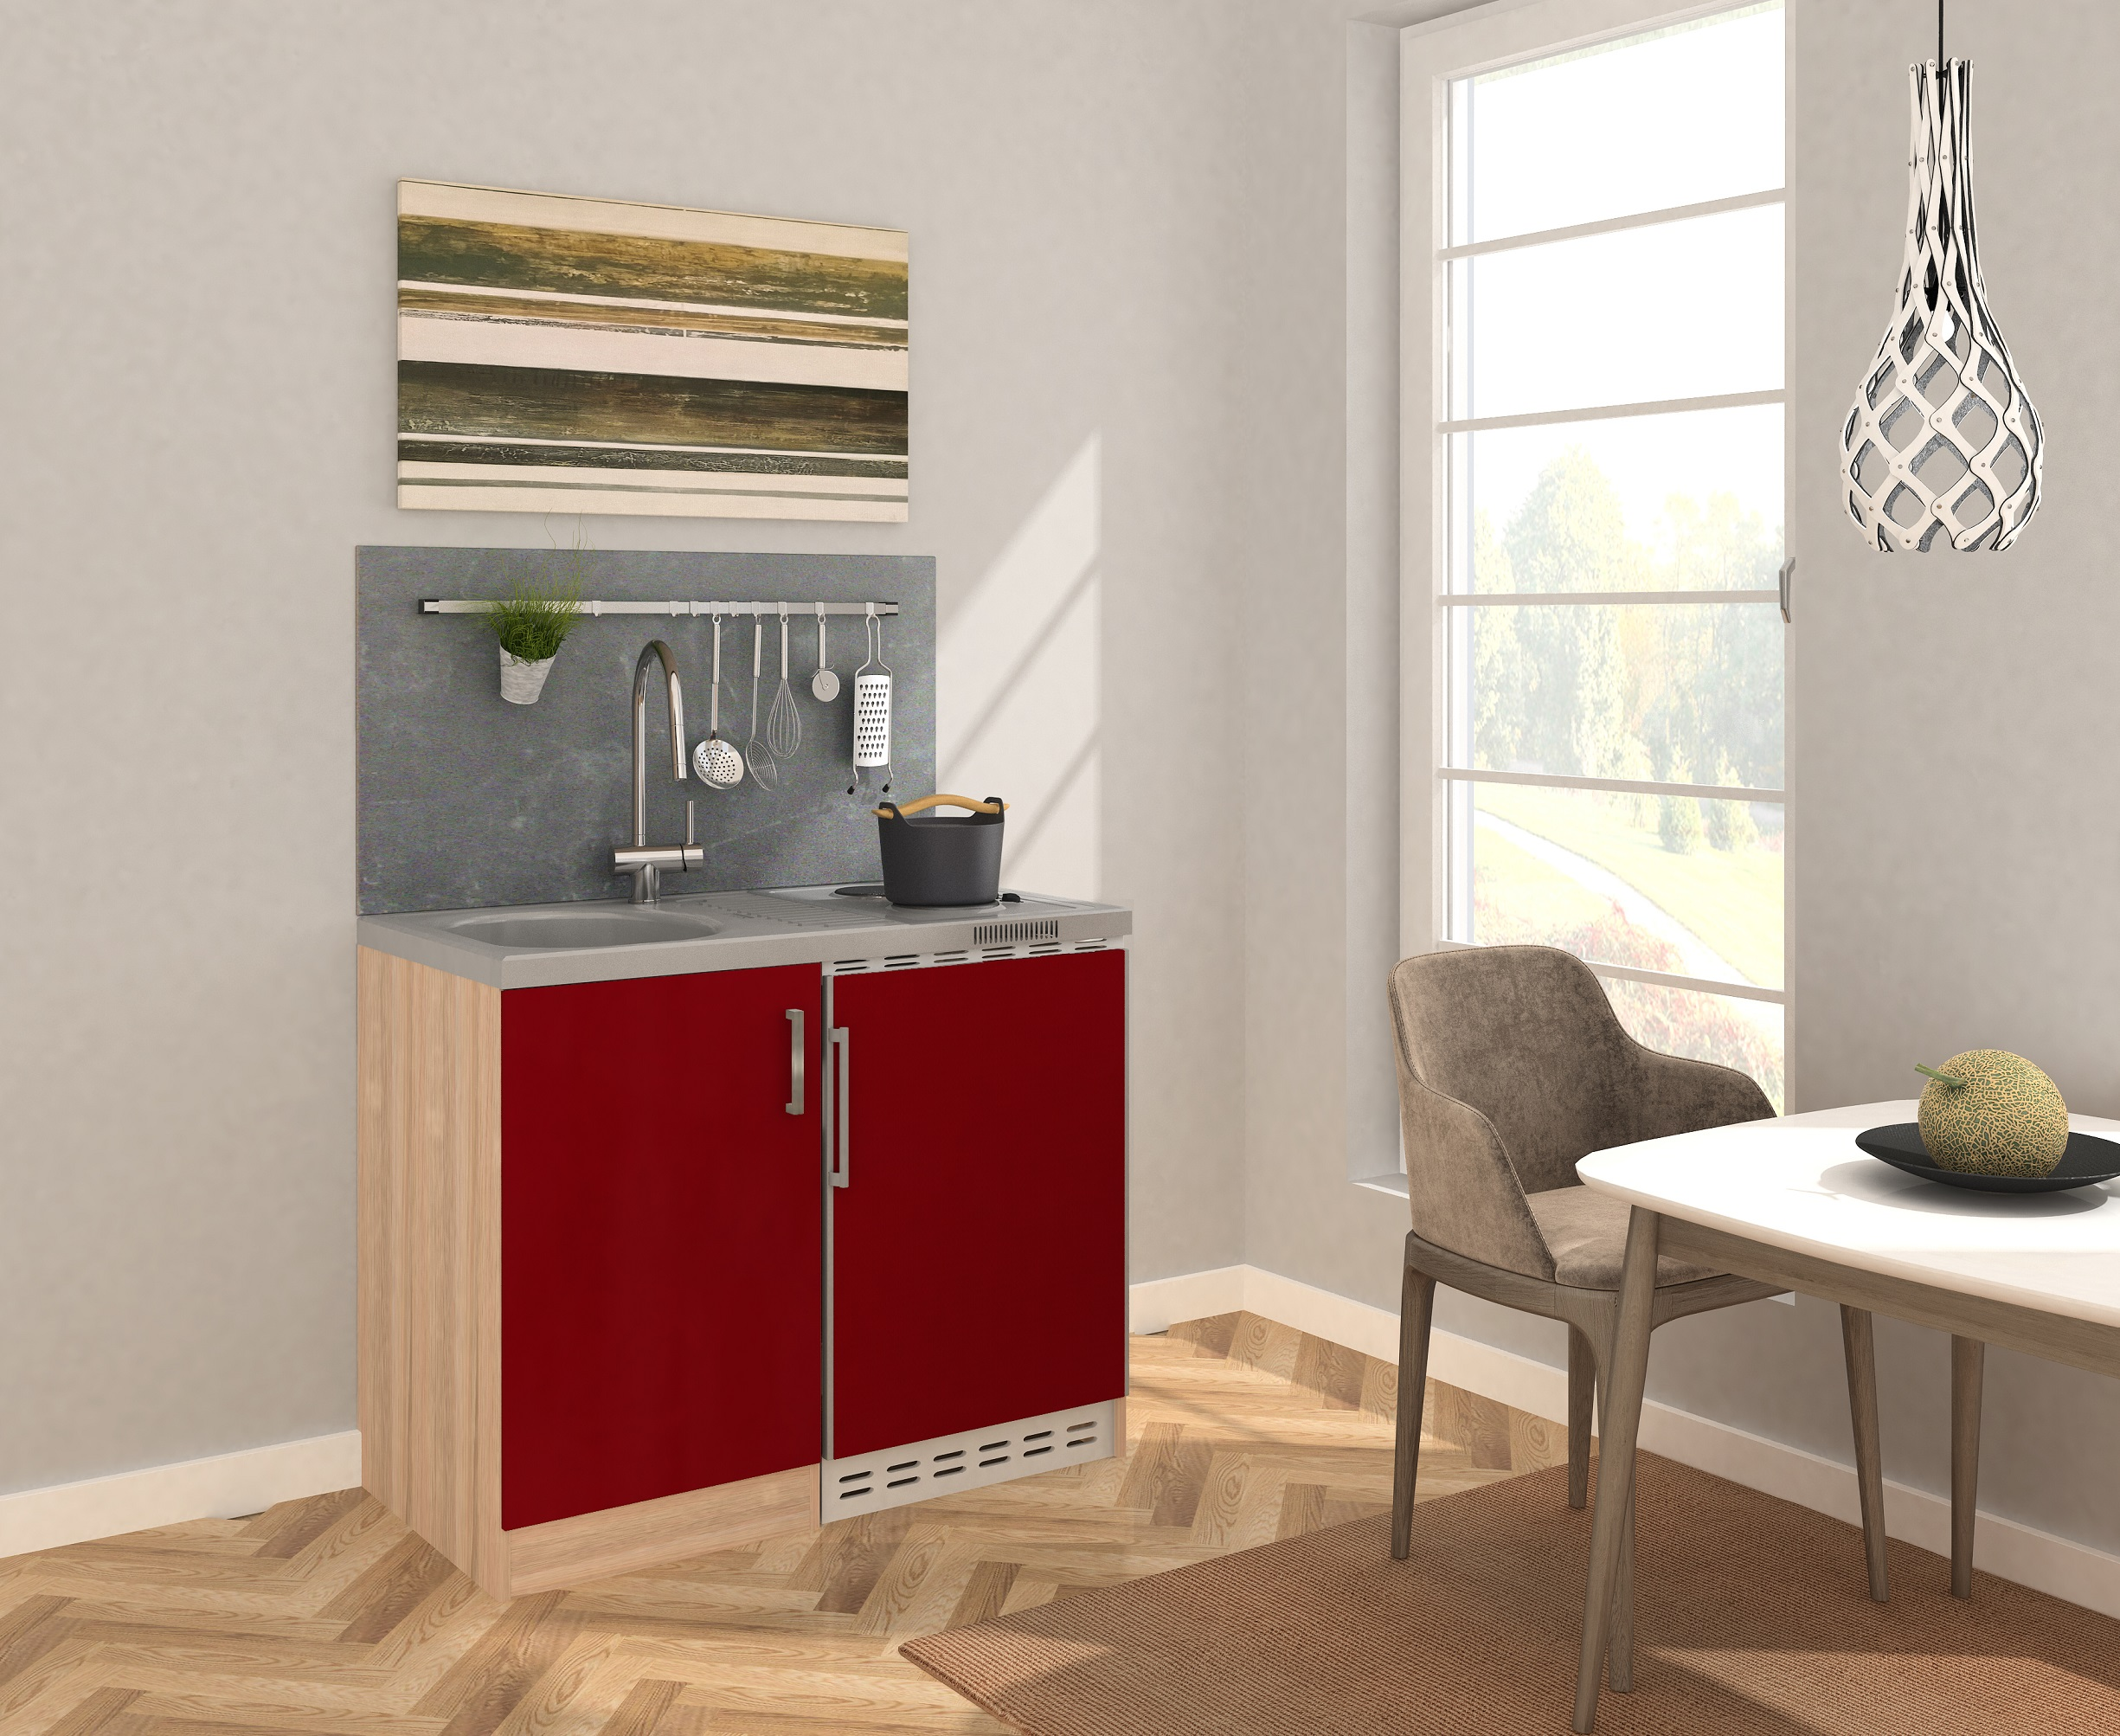 minik che k che k chenzeile pantry k chenblock 100 cm. Black Bedroom Furniture Sets. Home Design Ideas